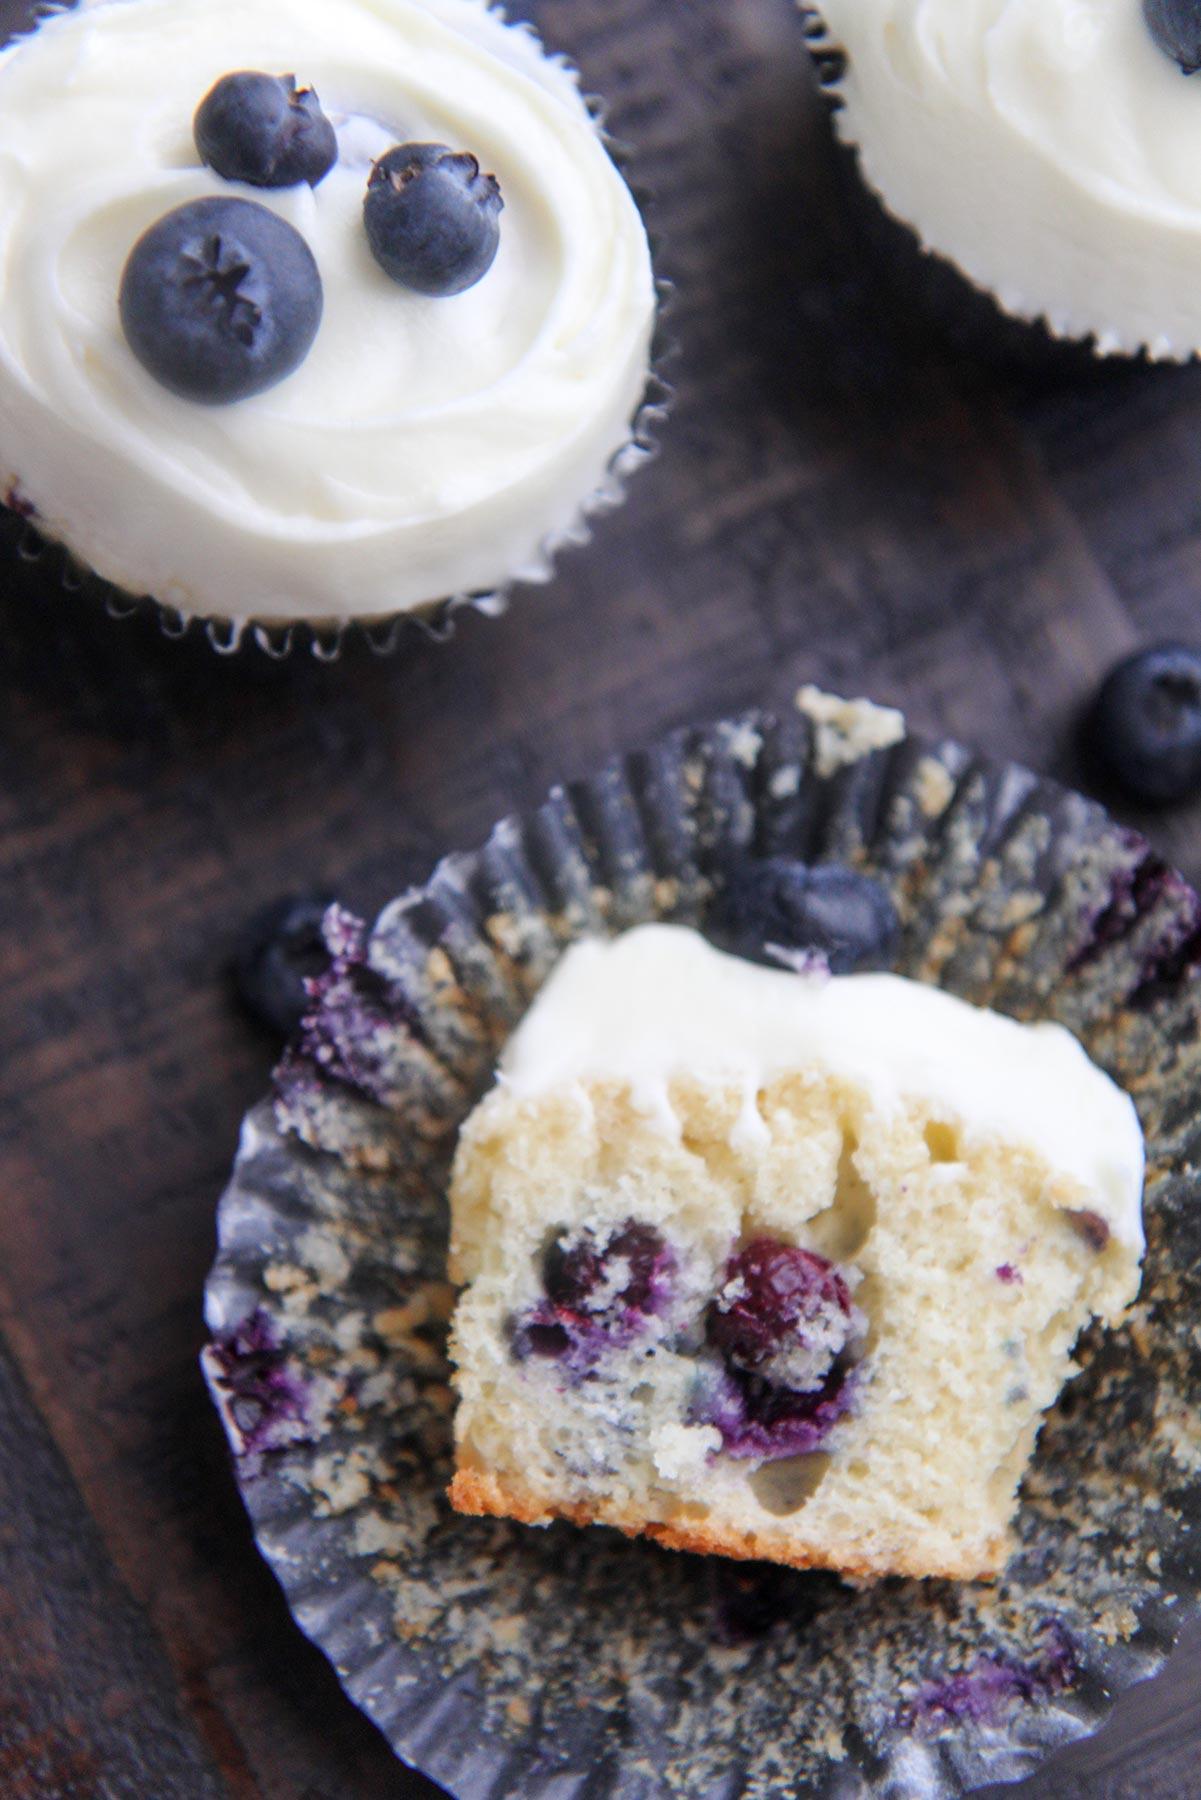 half eaten blueberry cupcake up close